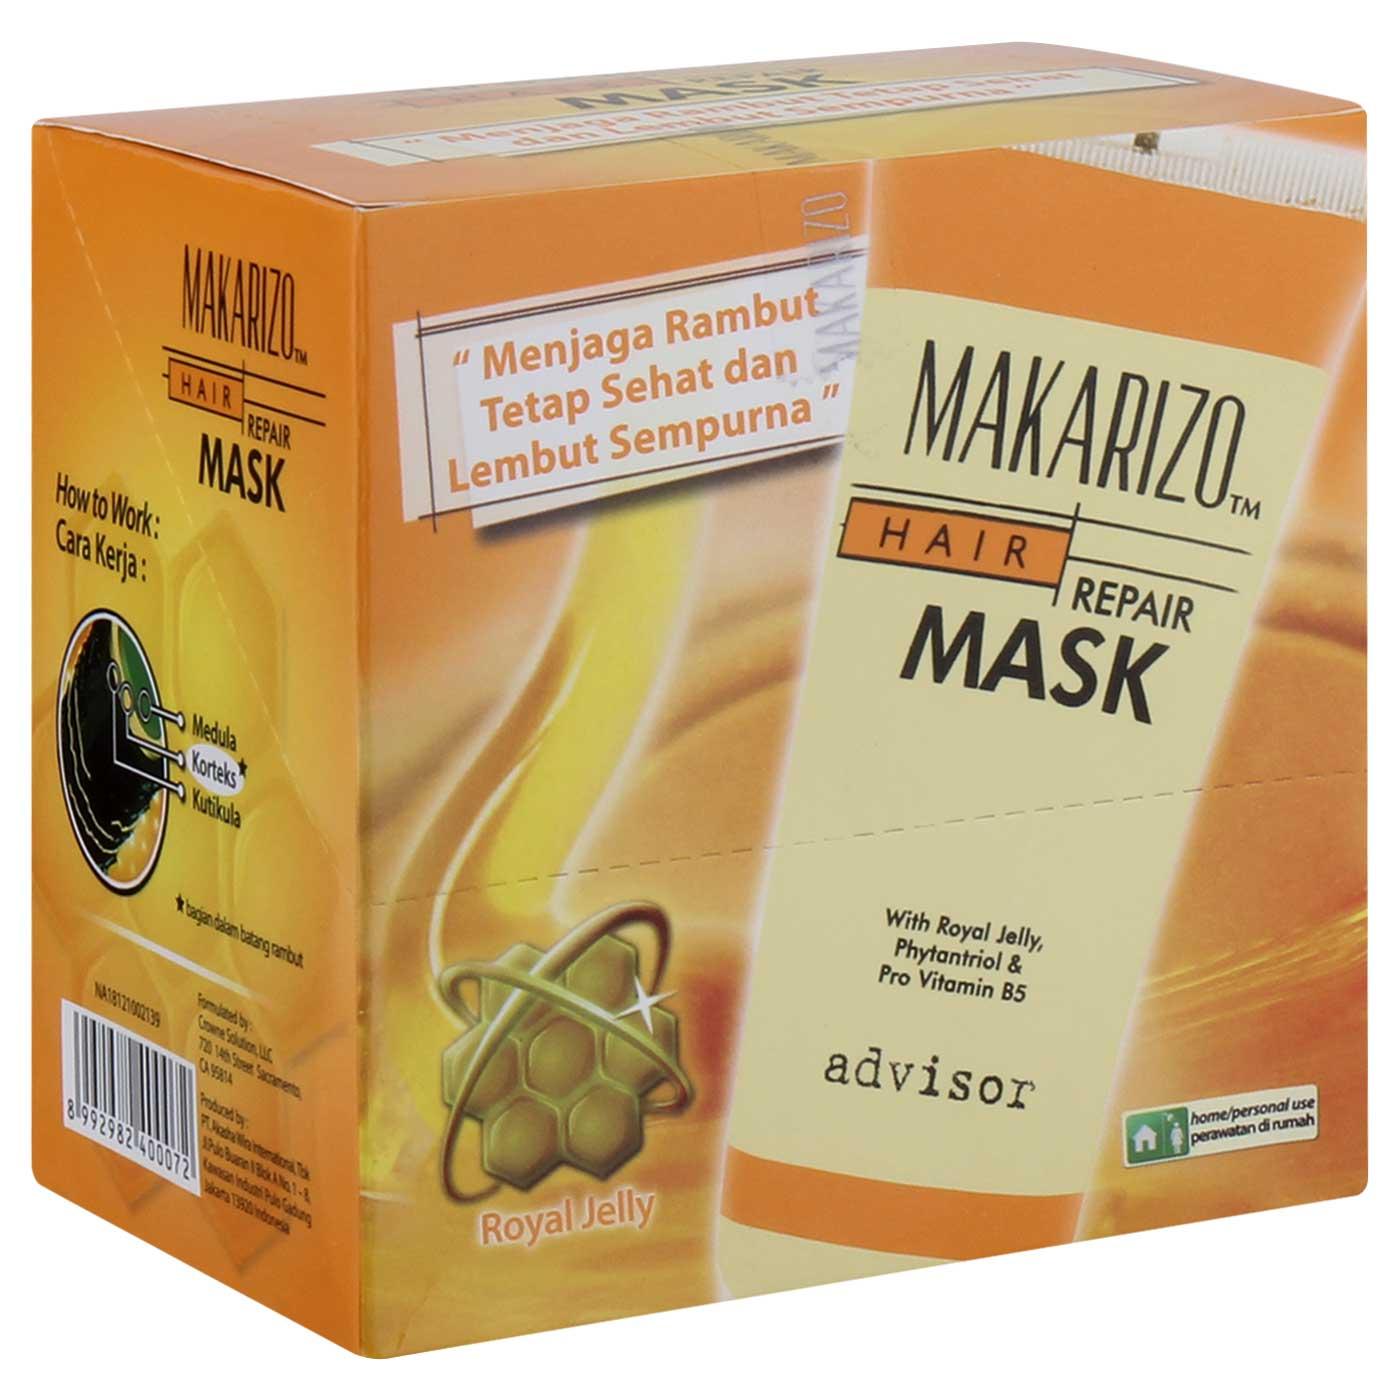 Jual Makarizo Advisor Hair Repair Mask Sachet 15 Ml X 12sachet Sampo Perawatan Rambut Termurah Harga Promo